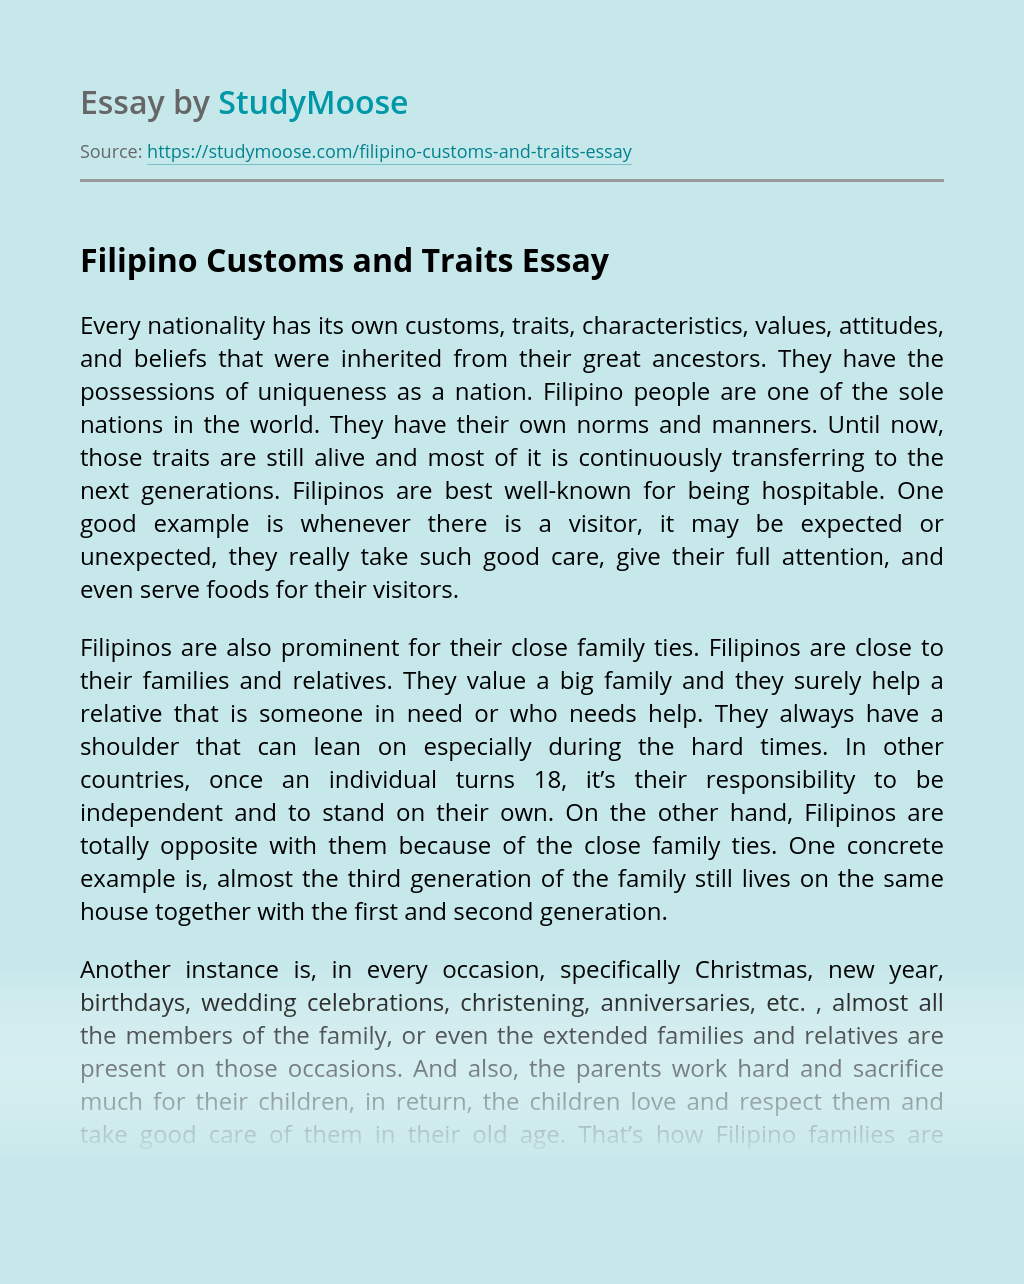 Filipino Customs and Traits